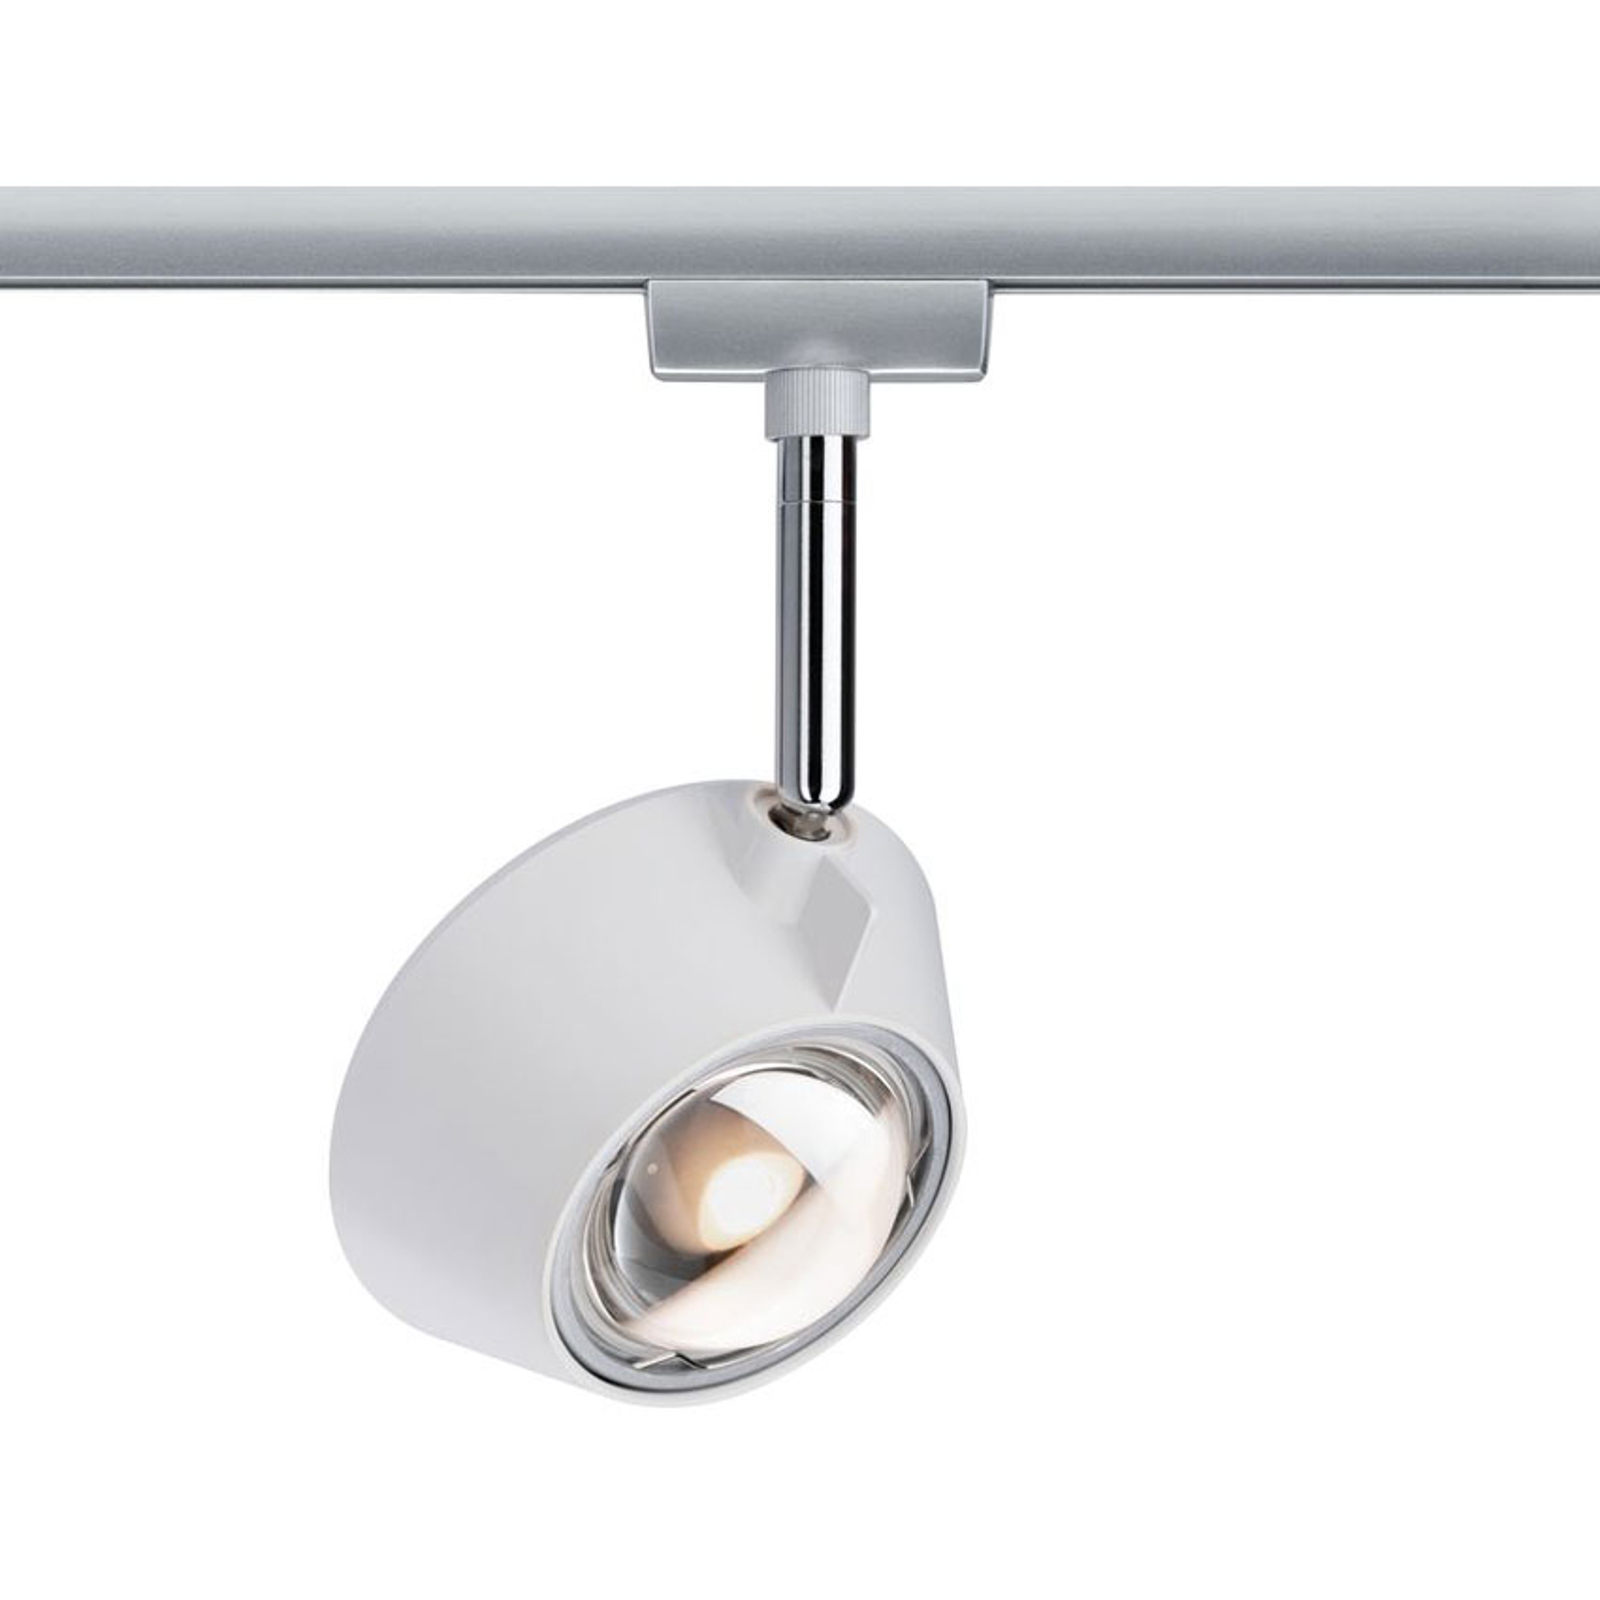 Paulmann URail LED-spot Sabik krom matt, dimbar